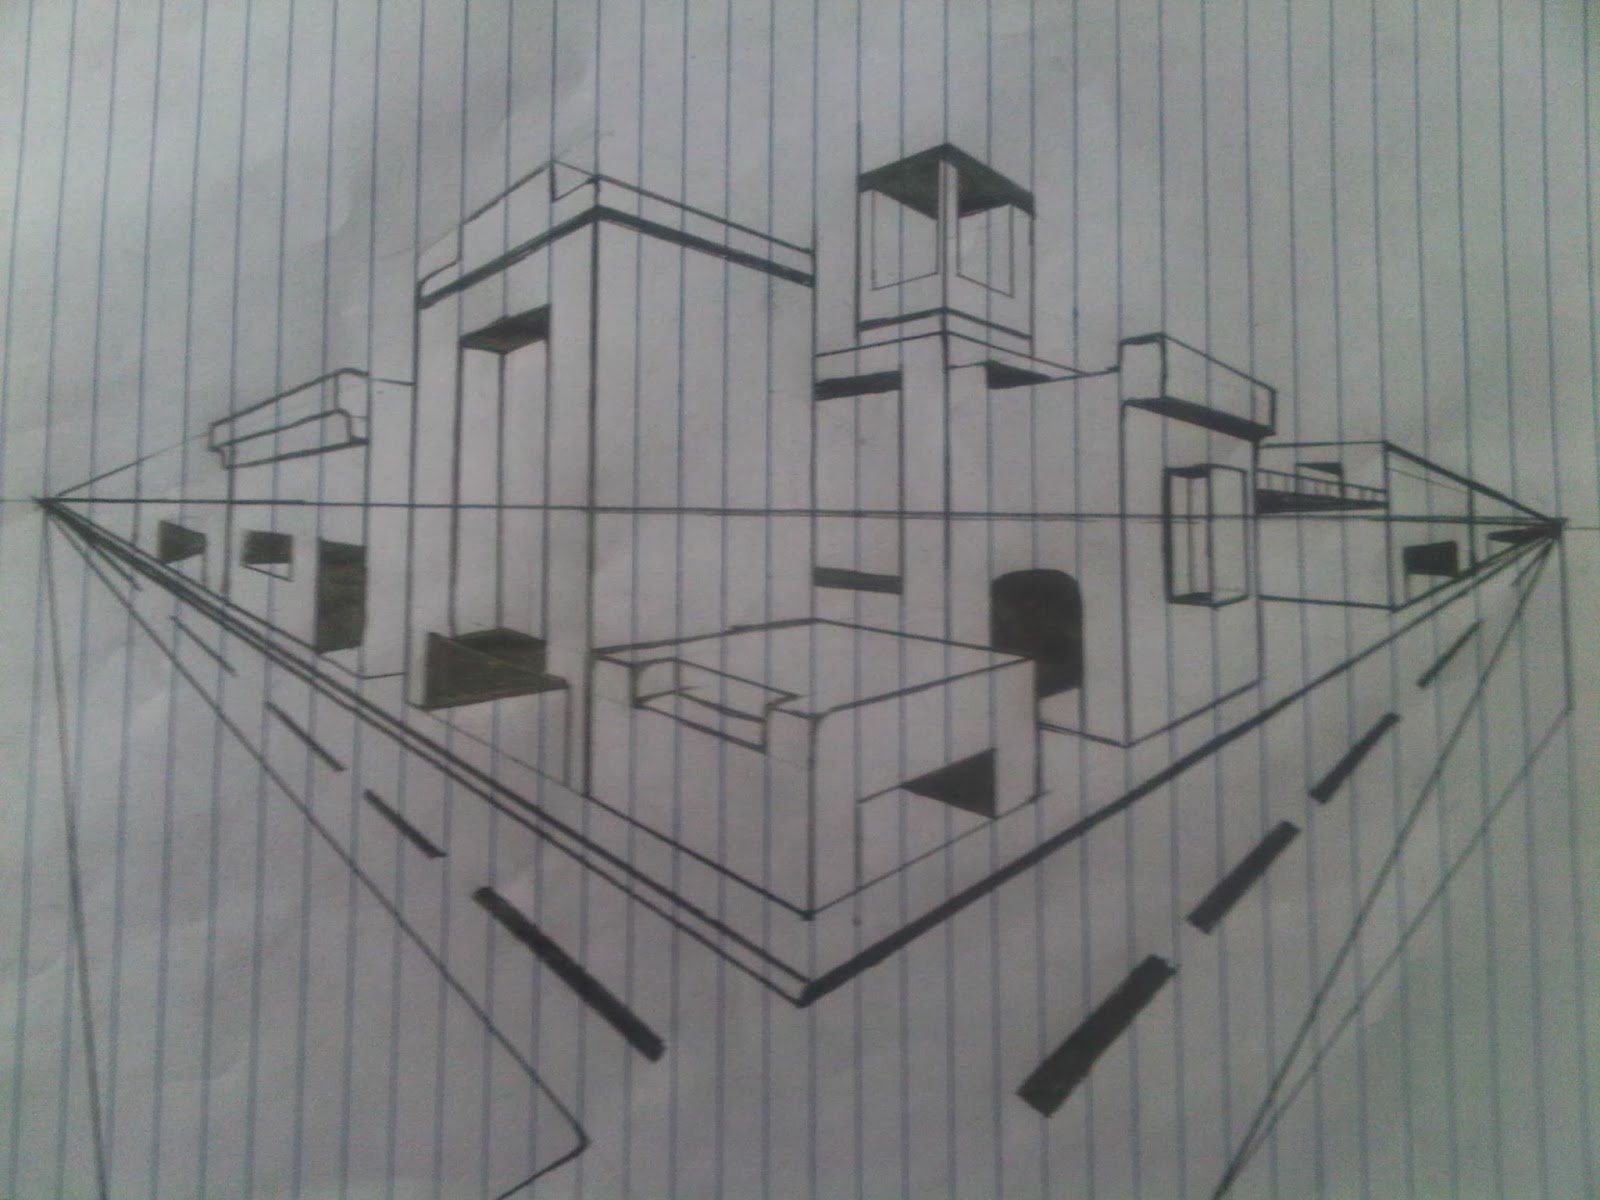 Sketsa Gambar Perspektif Gedung 2 Titik Hilang Sobsketsa